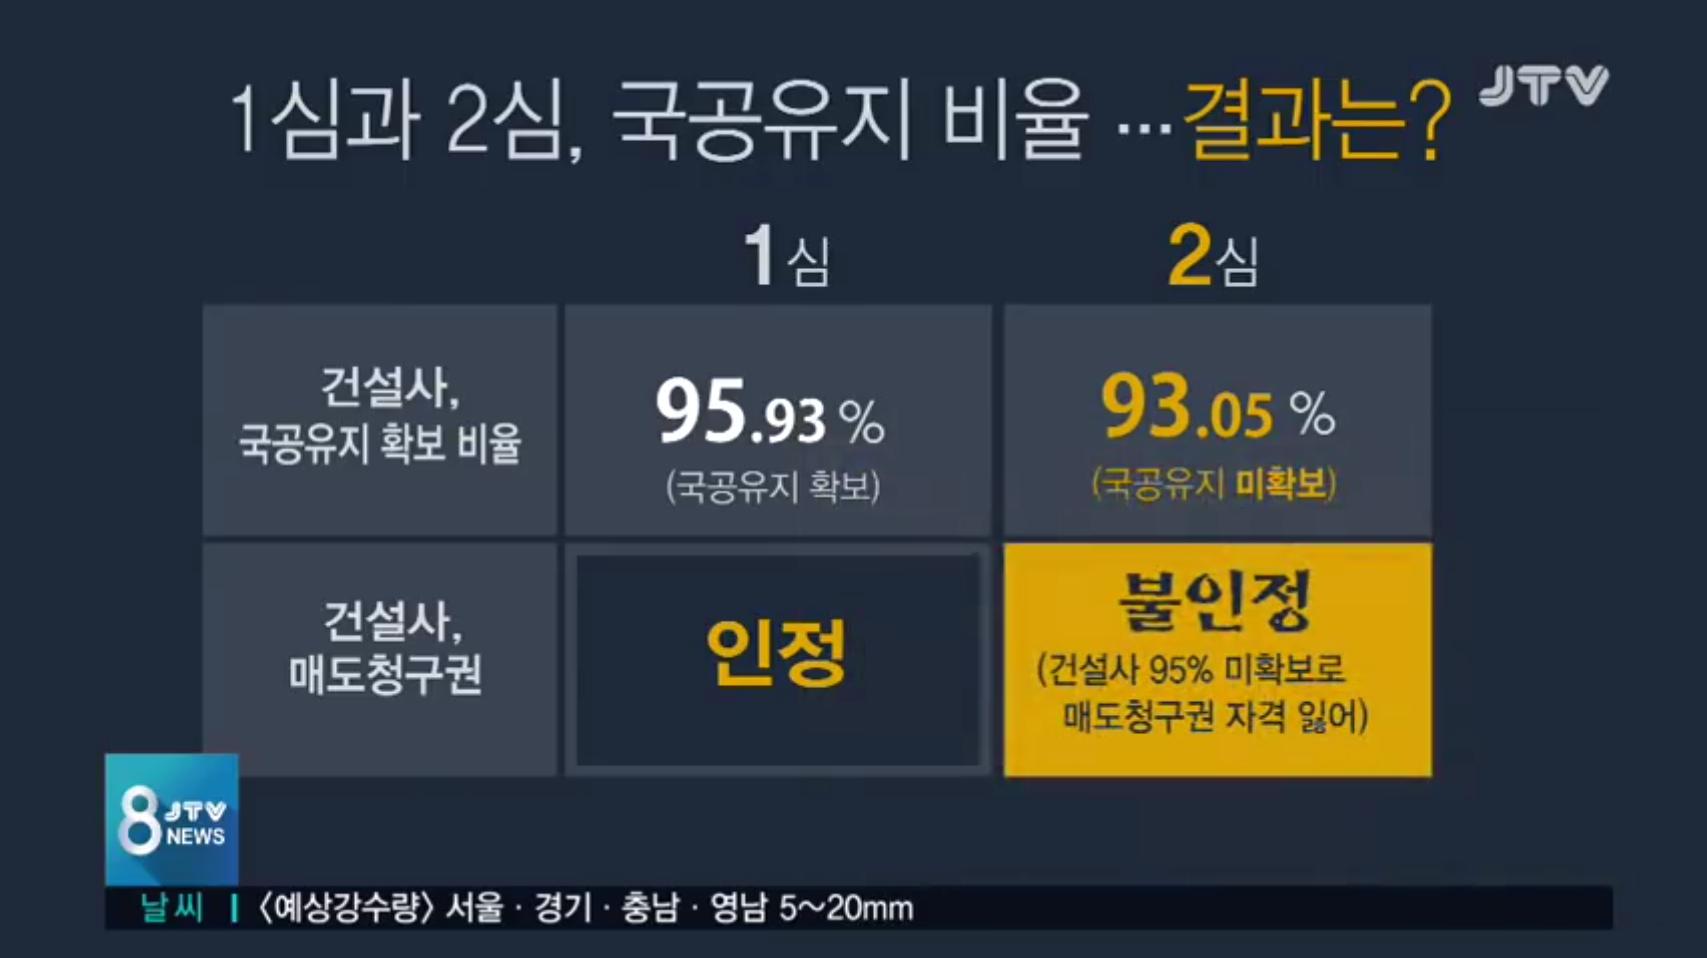 [19.4.25 JTV] 전주시, 정보공개 거부(토지사용승낙서, 국공유지 비율)로 주민은 2년 넘게 소송에 시달려4.png